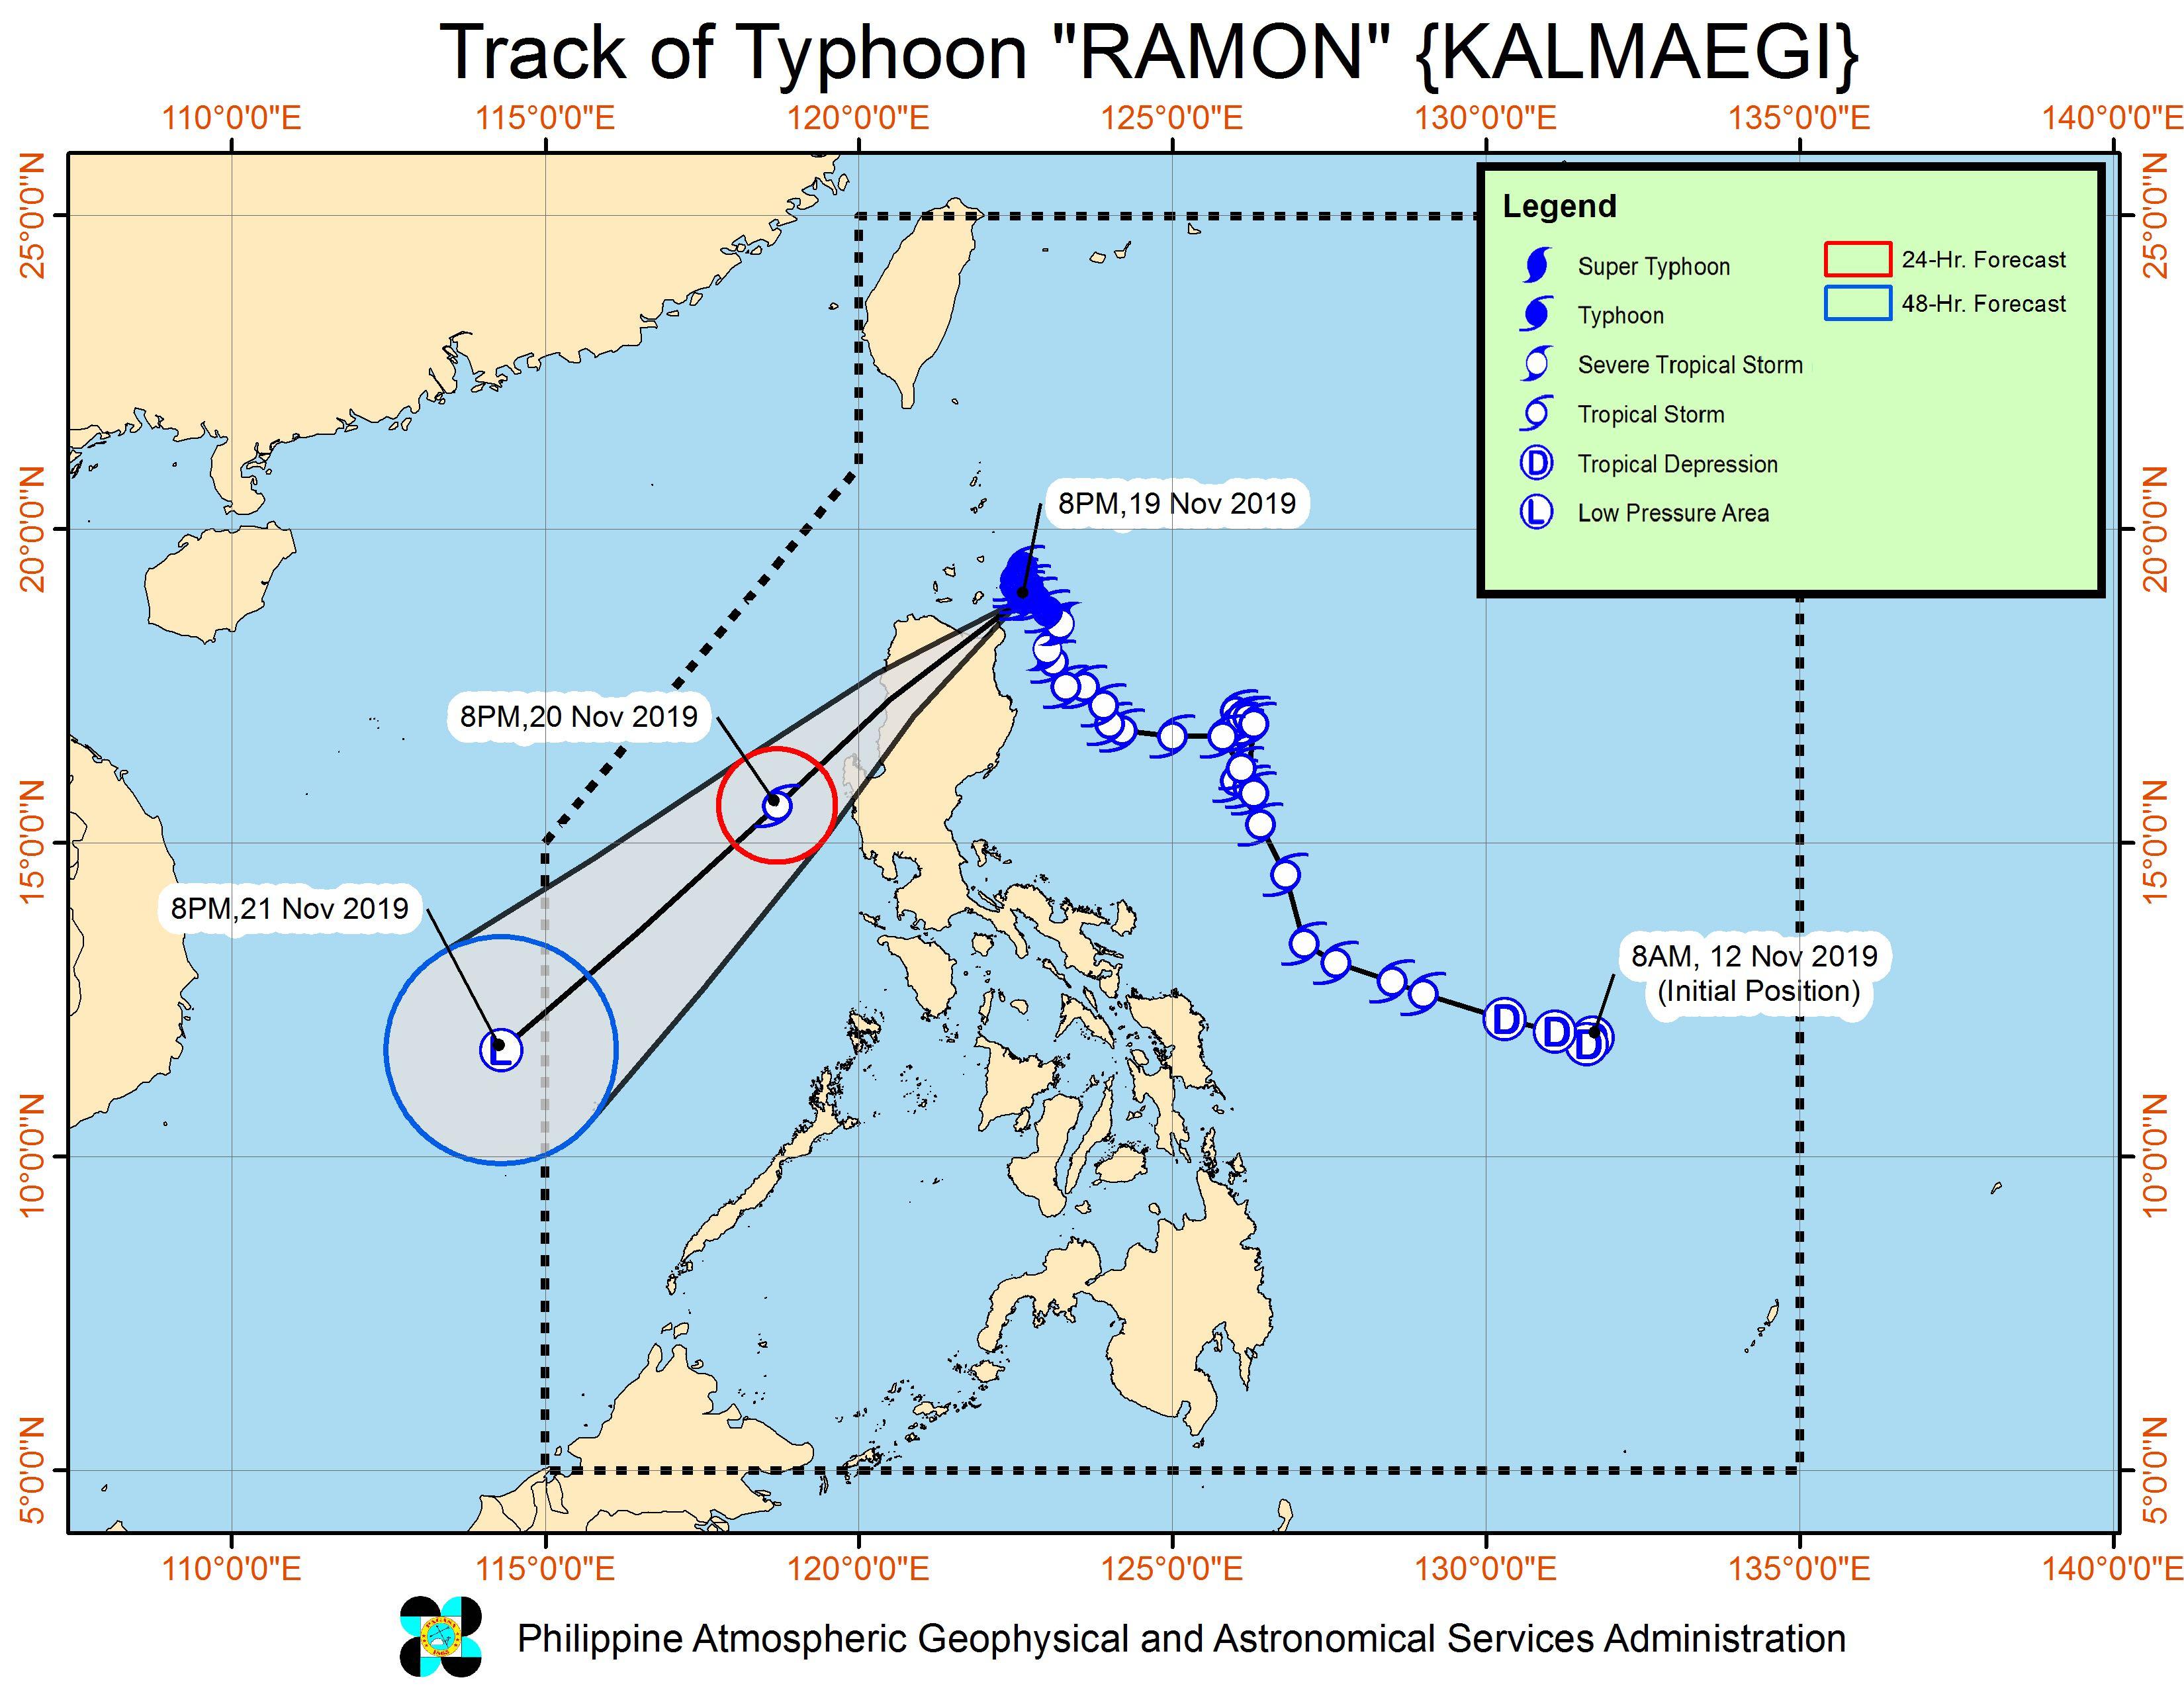 Forecast track of Typhoon Ramon (Kalmaegi) as of November 19, 2019, 11 pm. Image from PAGASA